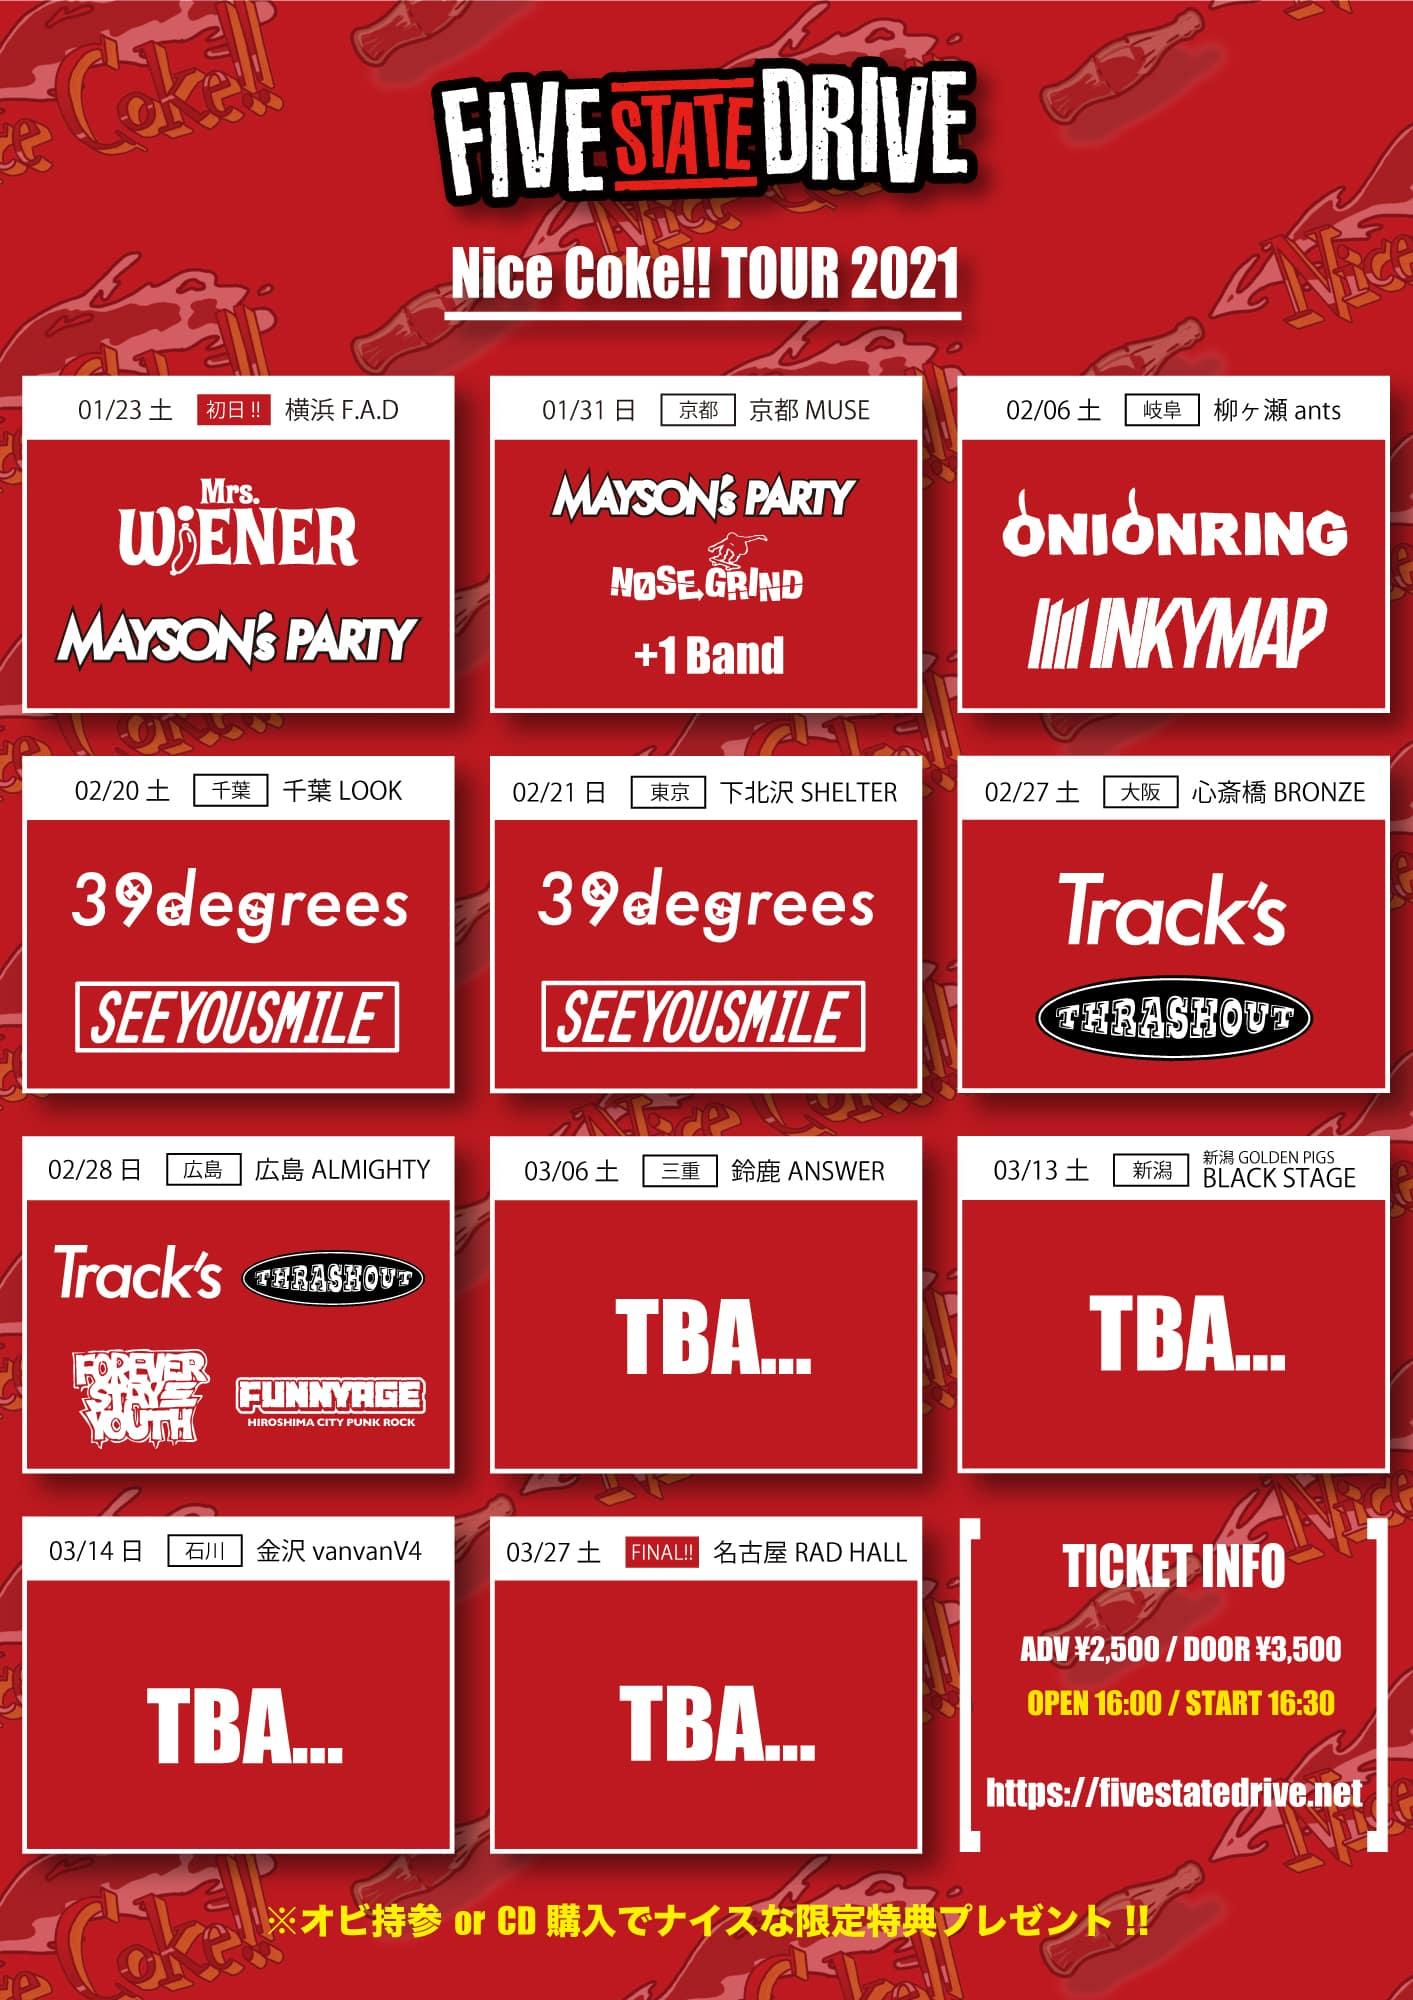 Nice Coke!! TOUR 2021